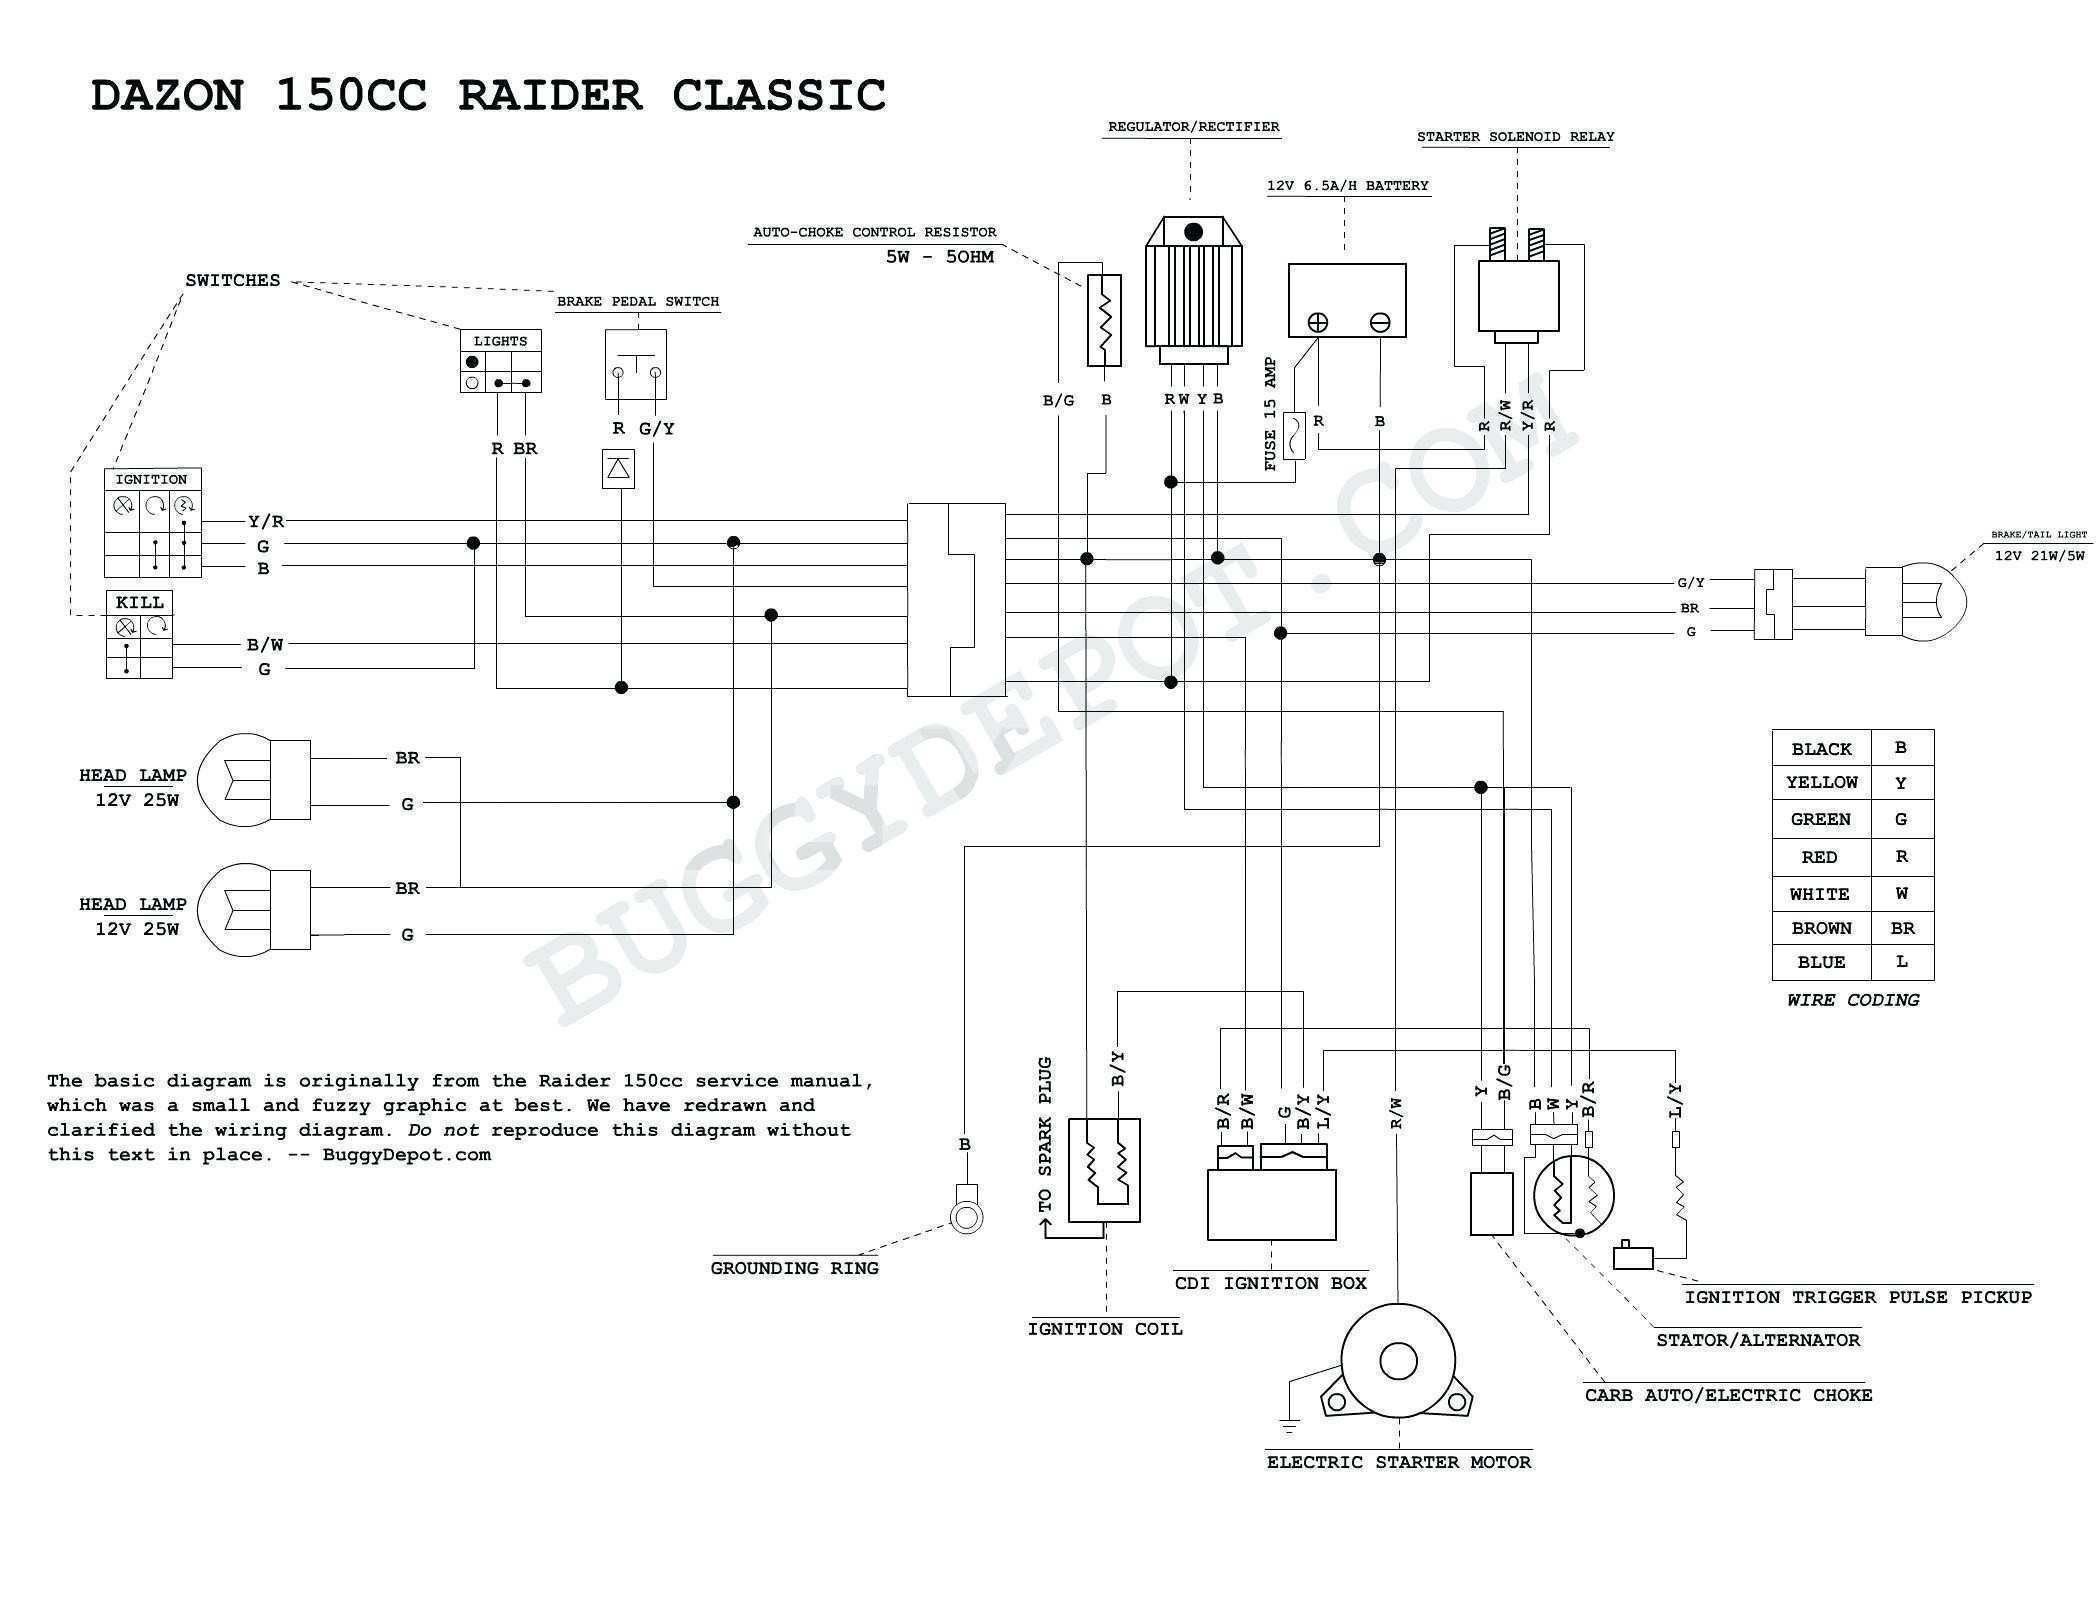 wiring diagram for hogtunes amp diagram diagramtemplate hogtunes wiring diagram [ 2100 x 1600 Pixel ]